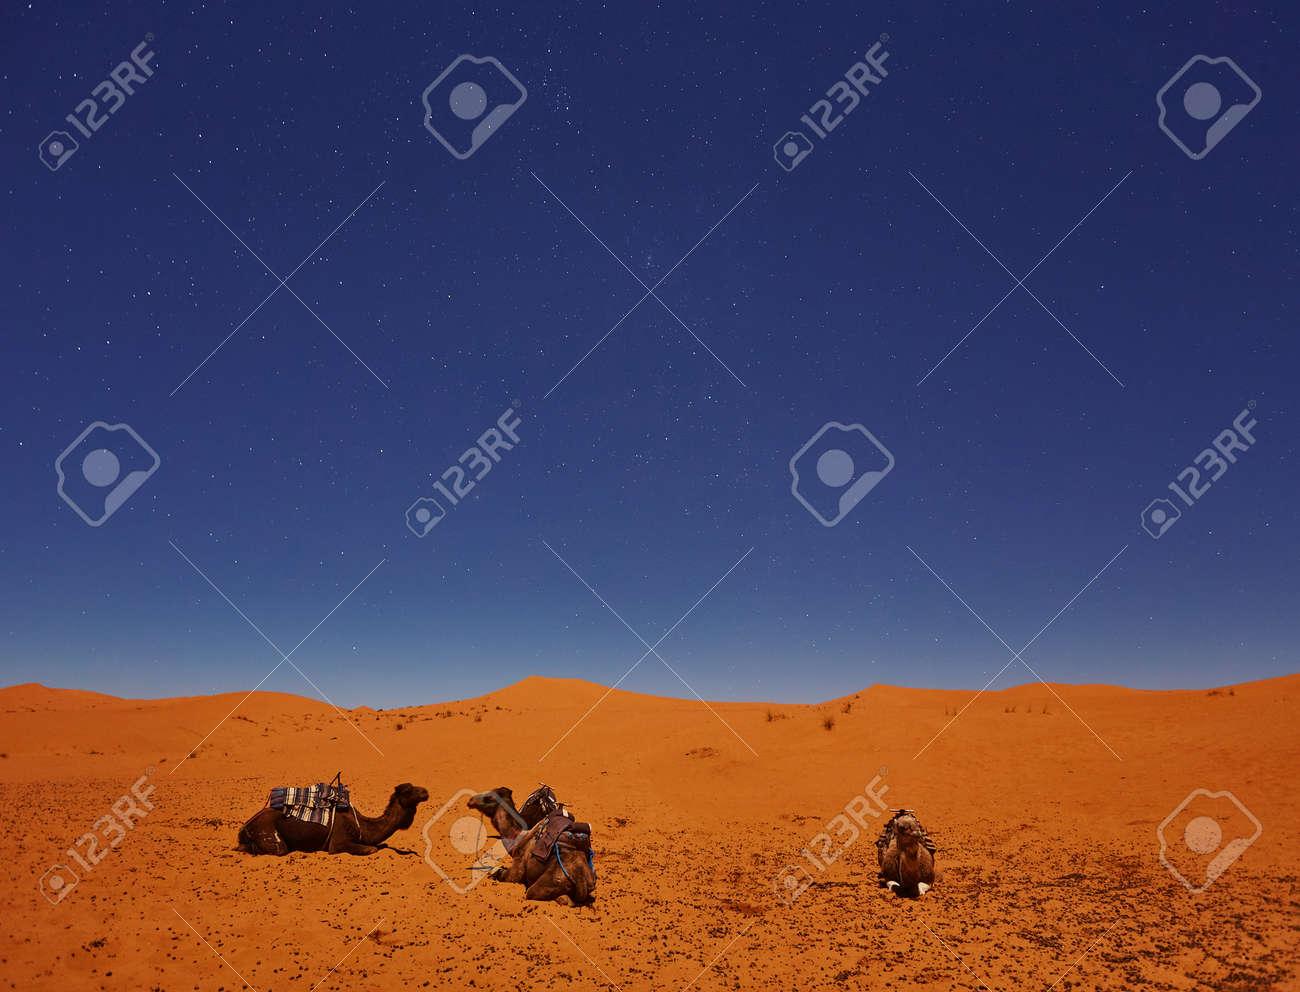 Camels sleep under the starry sky in sahara desert, Morocco. - 169020202